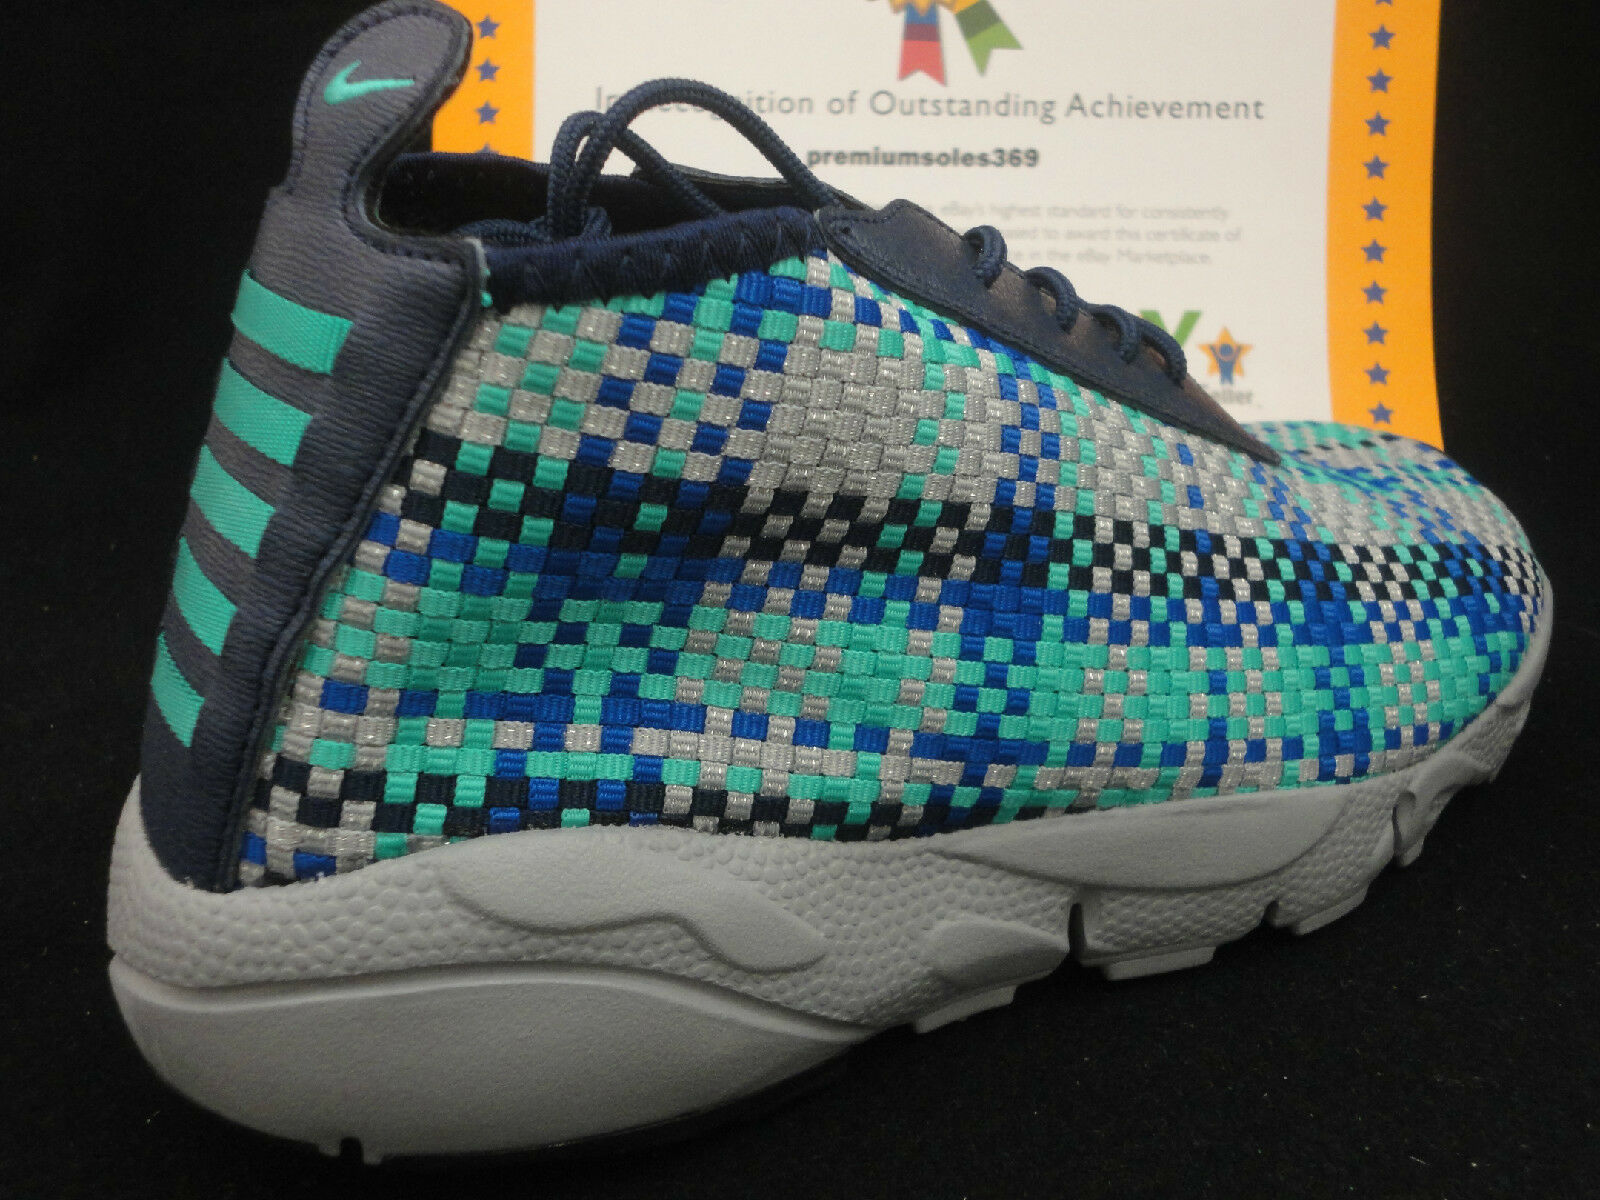 Nike Air Footscape Desert Chukka, Navy / Hyper Jade / Silver, Woven, Size 8